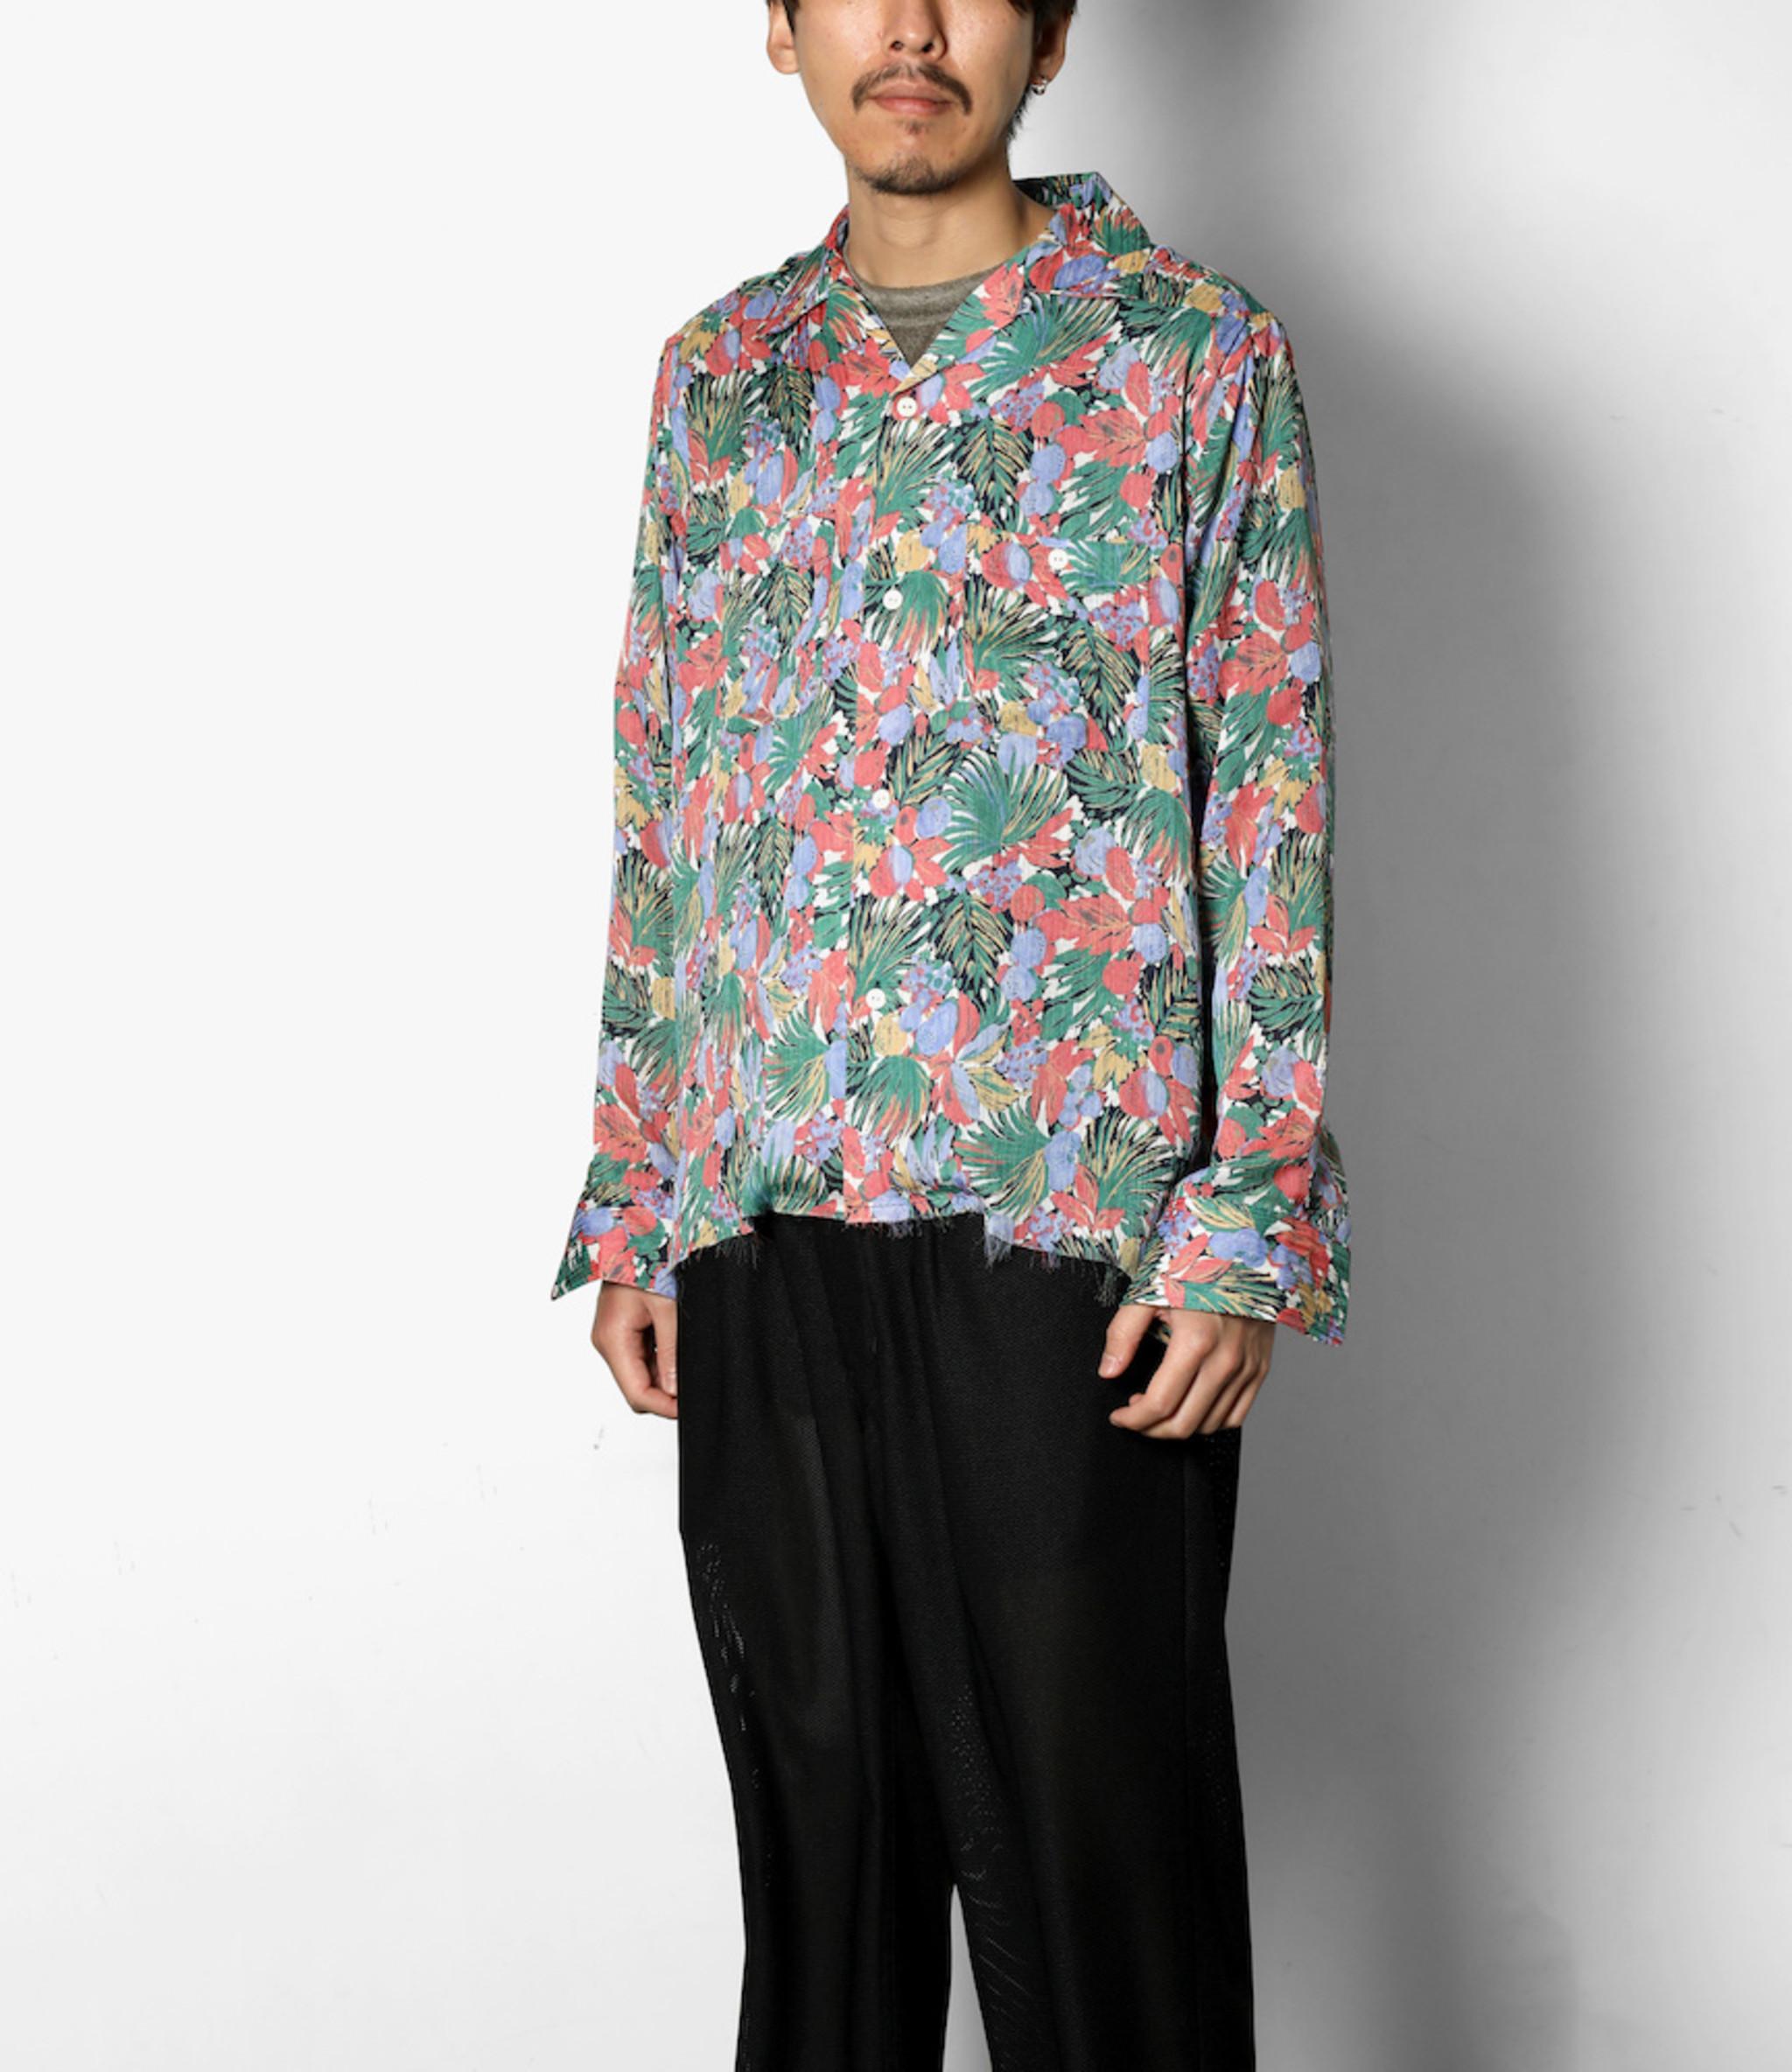 Needles Cut-Off Bottom One-Up Shirt - Double Crepe / Floret Pt. - Navy/Pink